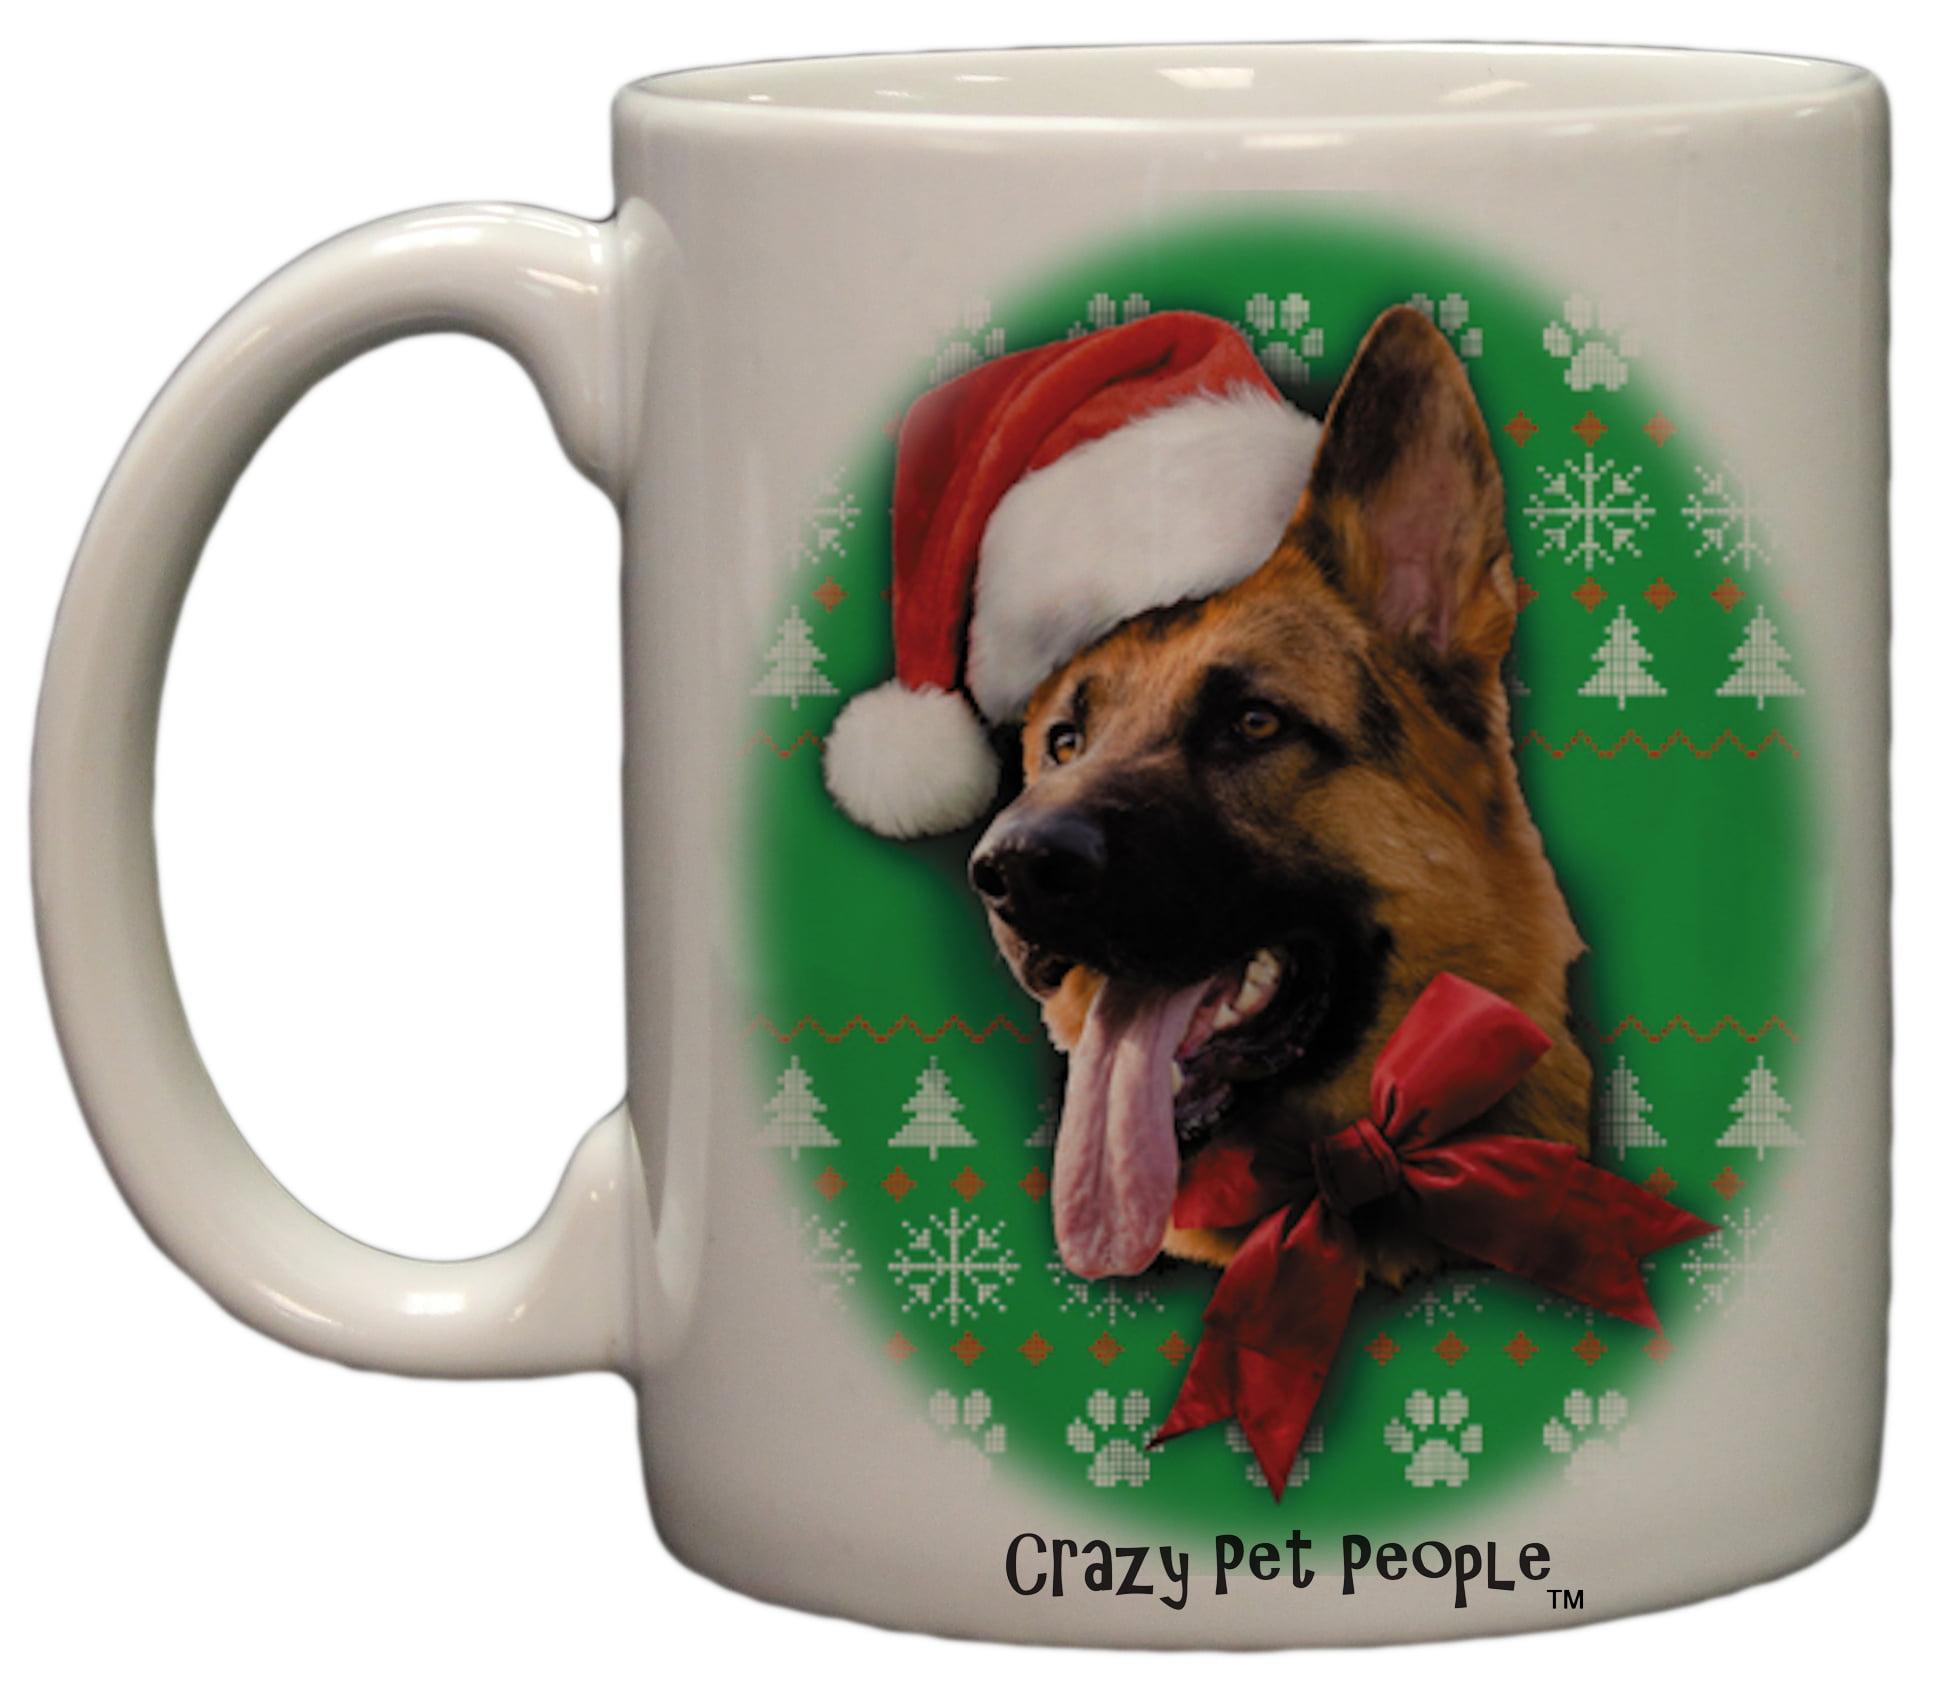 German Shepherd Christmas Sweater.Dog Lovers German Shepherd Ugly Sweater Christmas Design Ceramic Coffee Mug